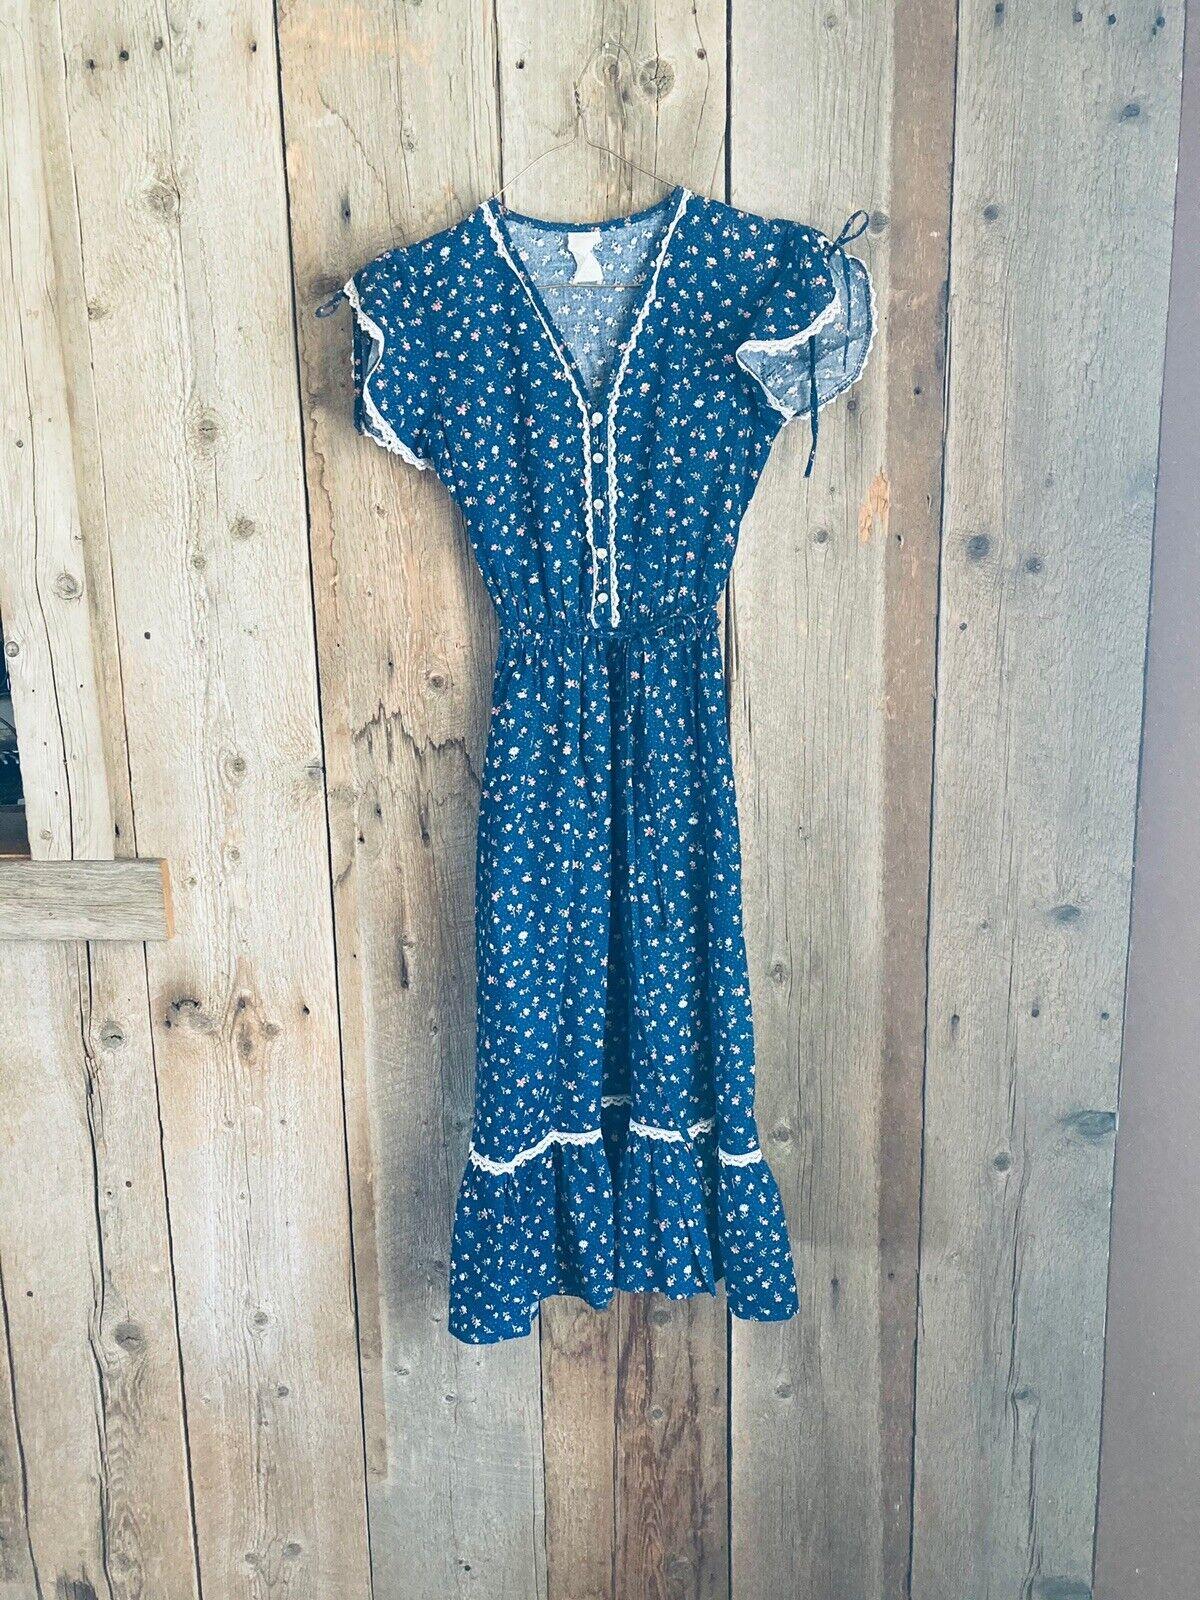 vintage prairie calico gunne sax style dress - image 1